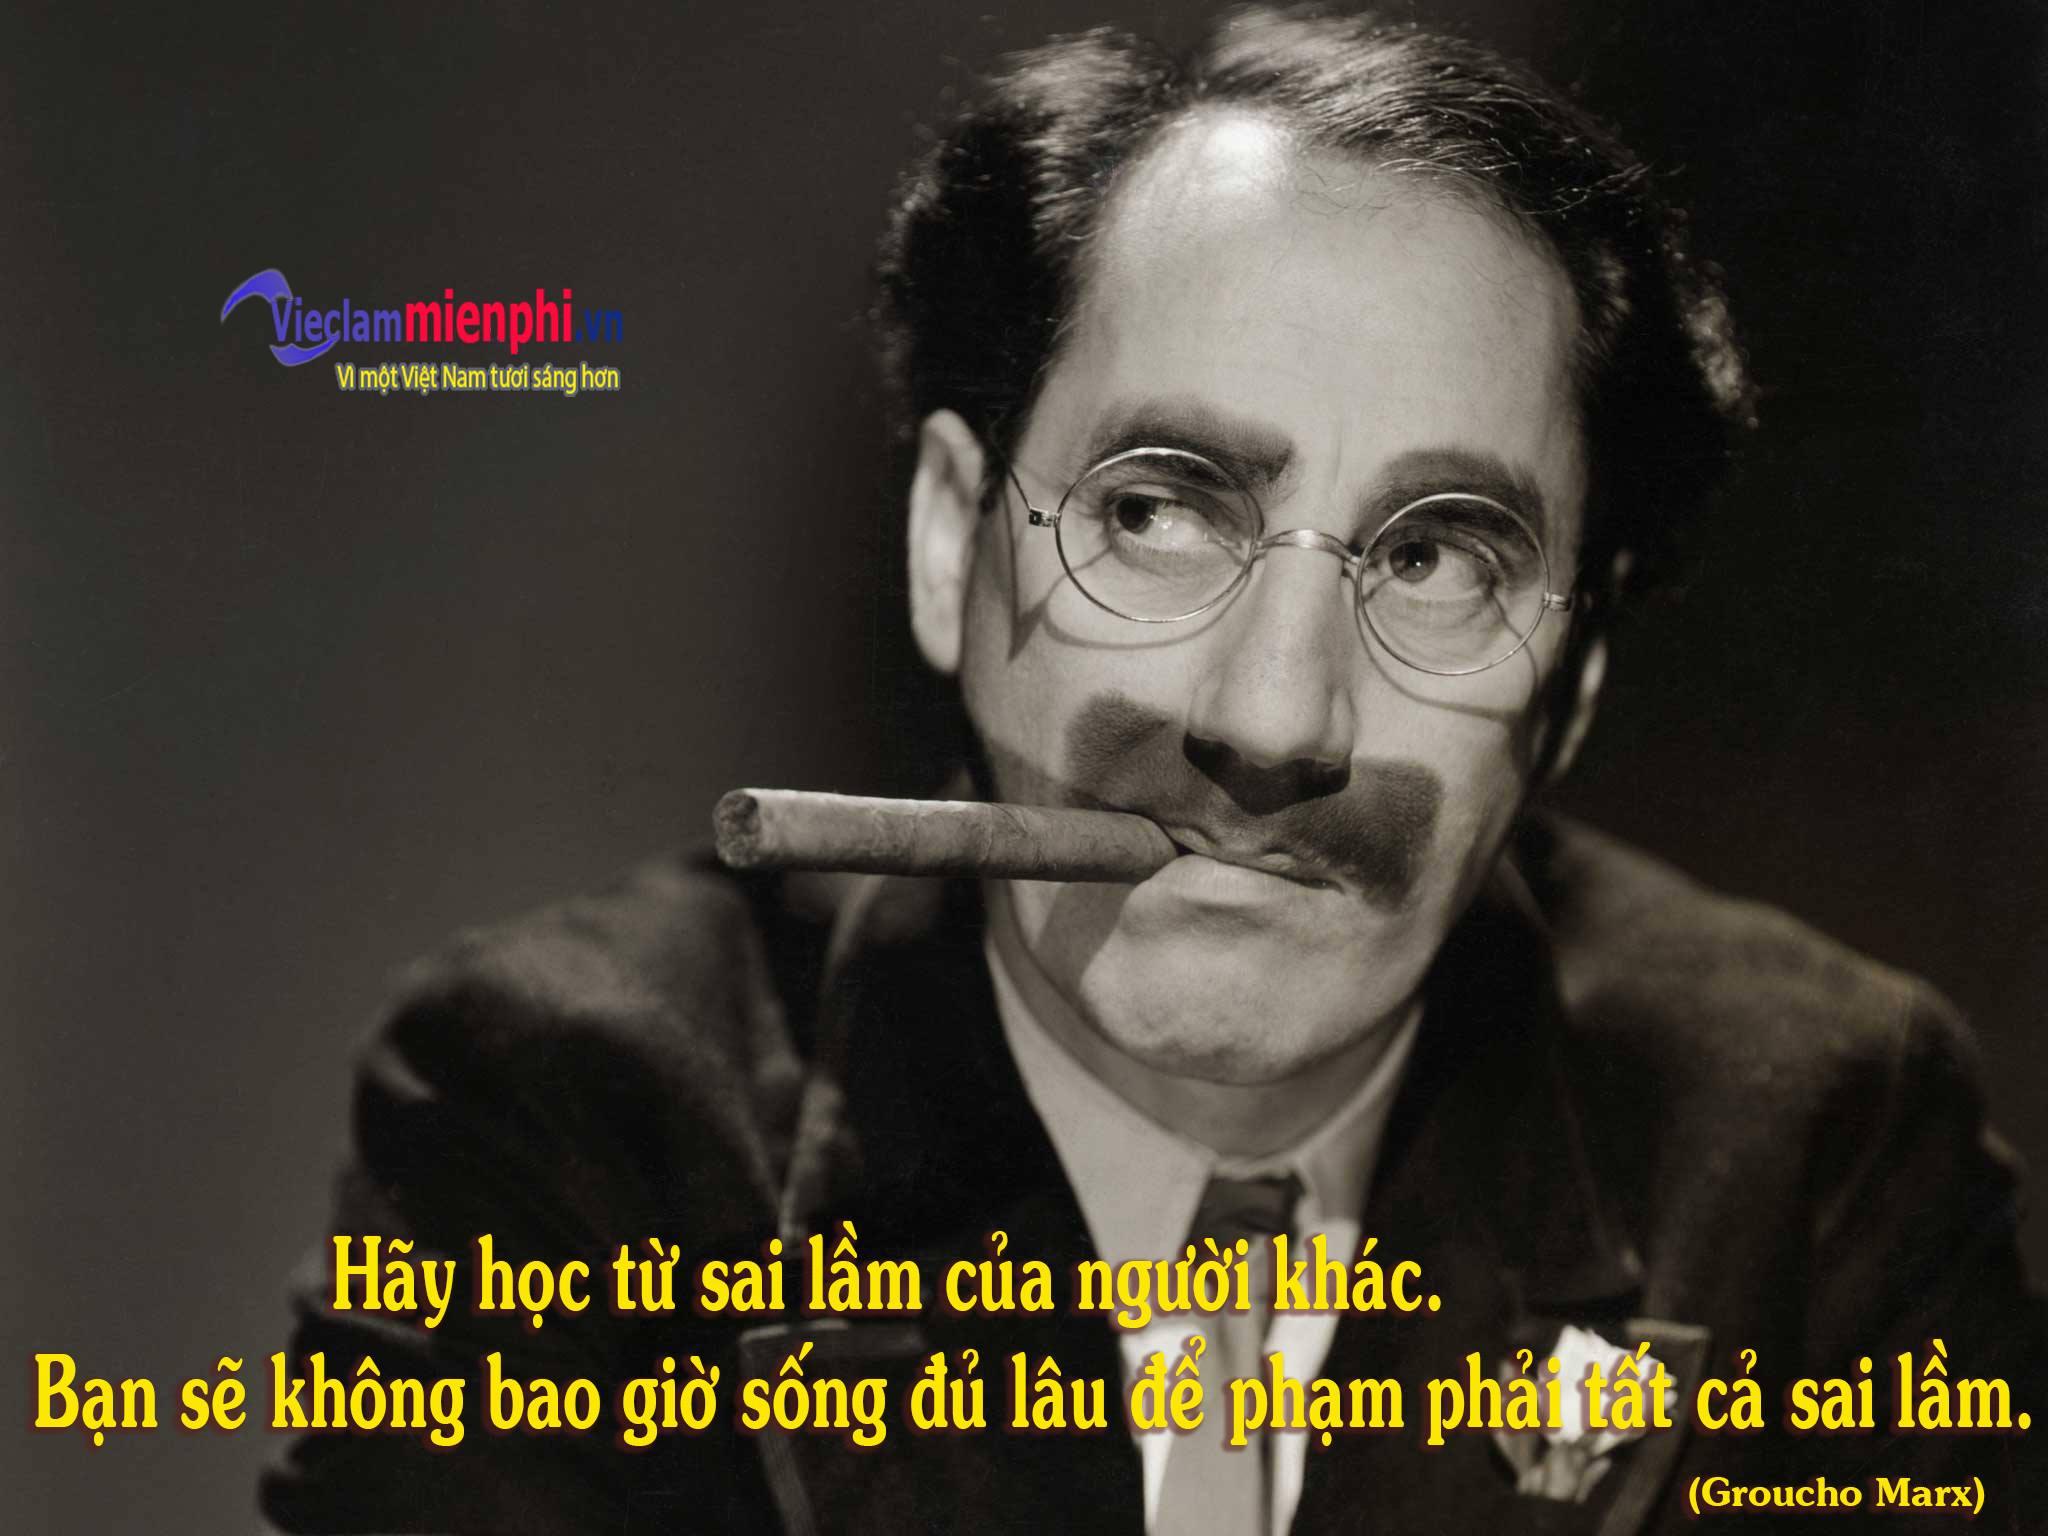 hay-hoc-tu-sai-lam-cua-nguoi-khac-ban-se-khong-song.jpg